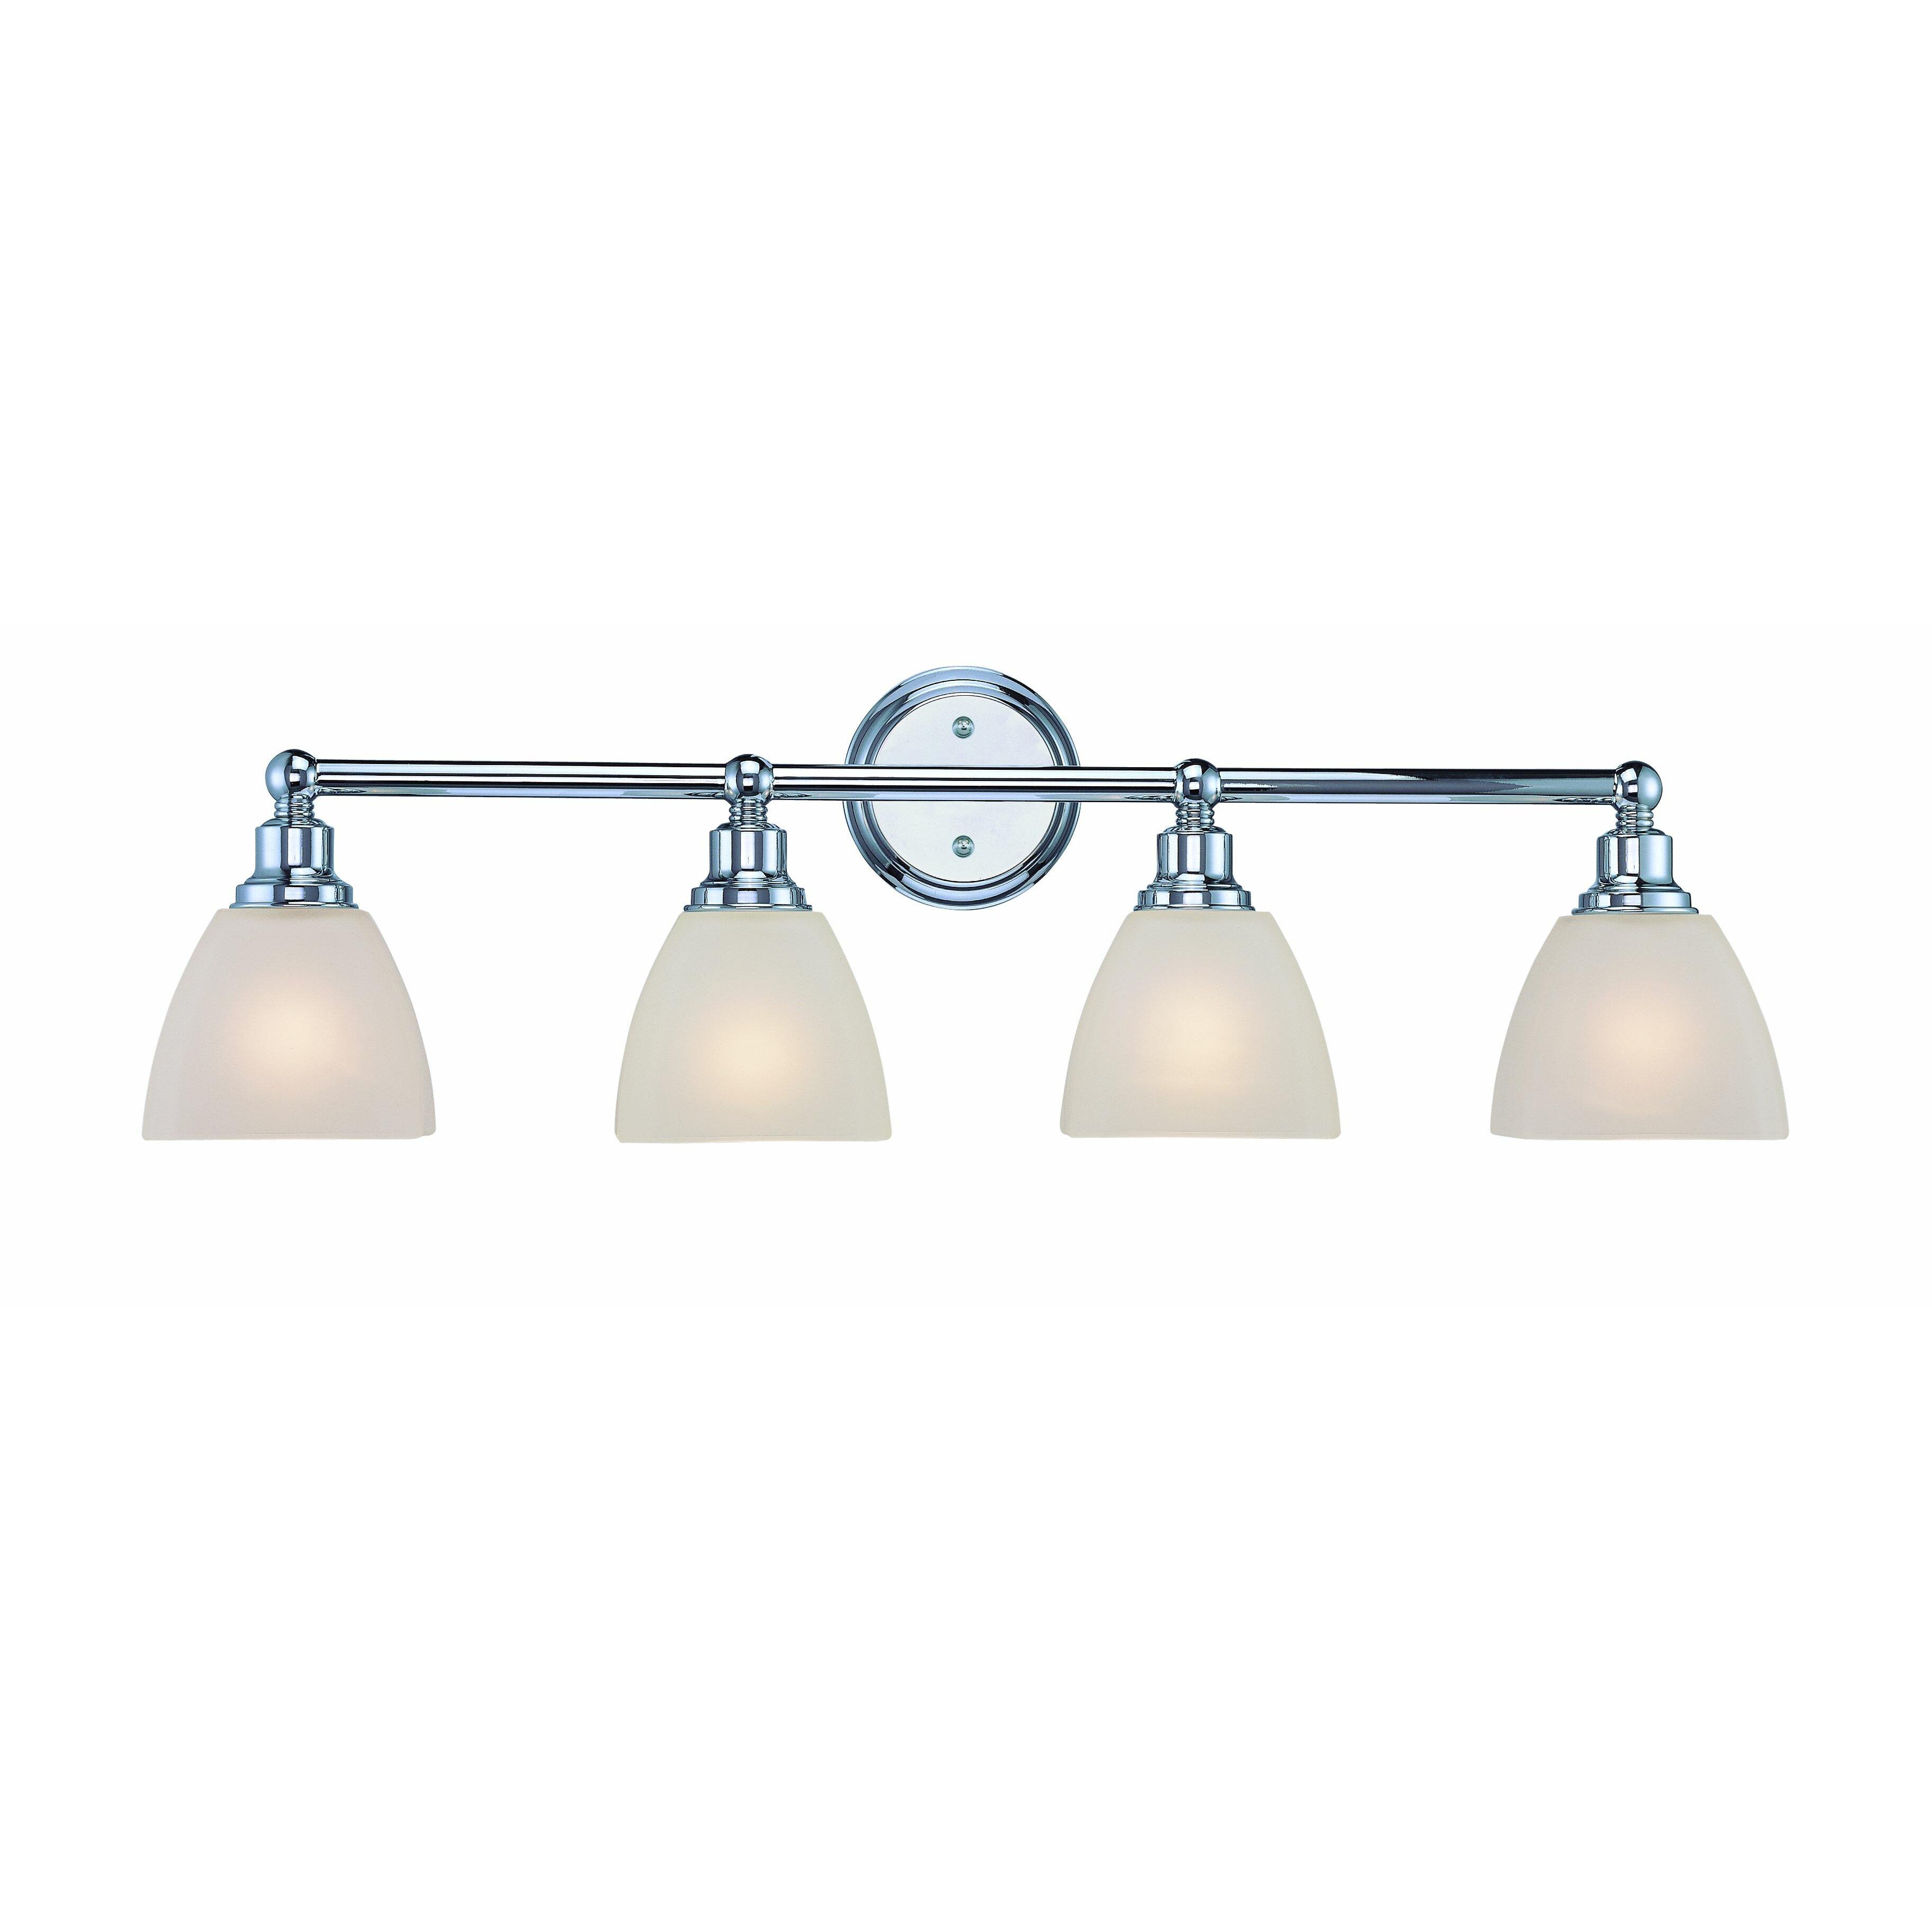 Craftmade Bradley 4 Light Vanity Light & Reviews Wayfair